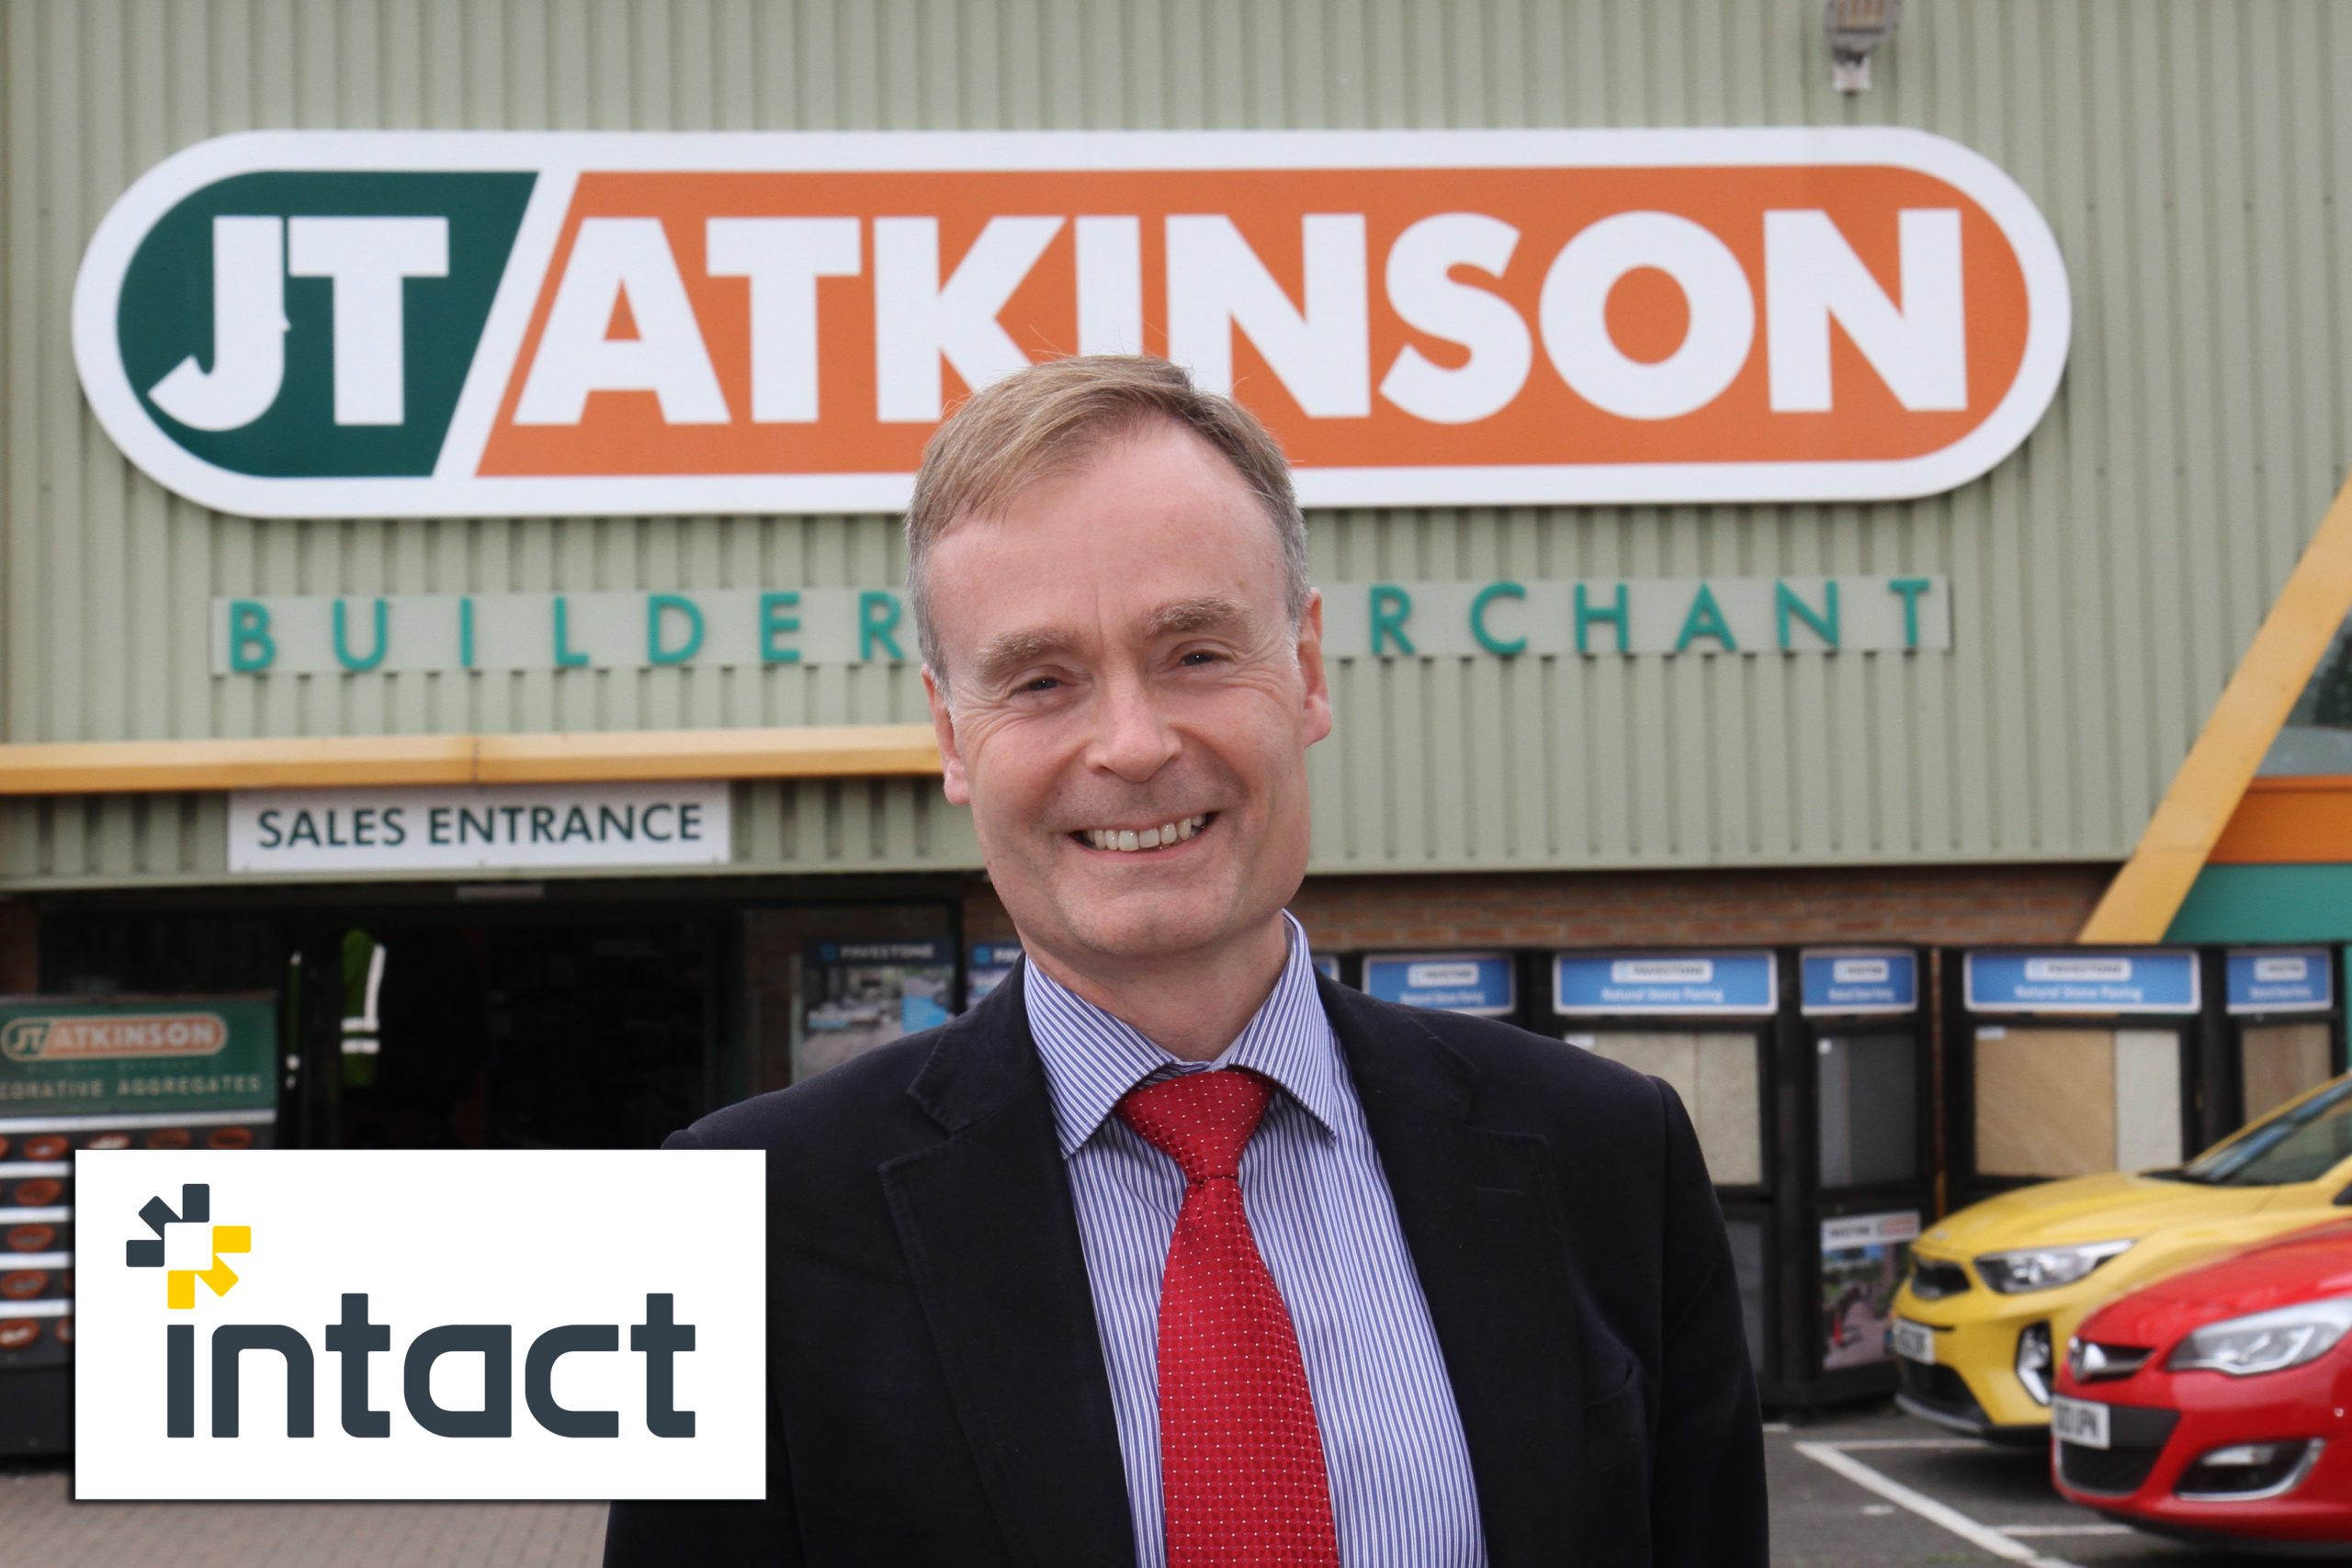 JT Atkinson selects Intact